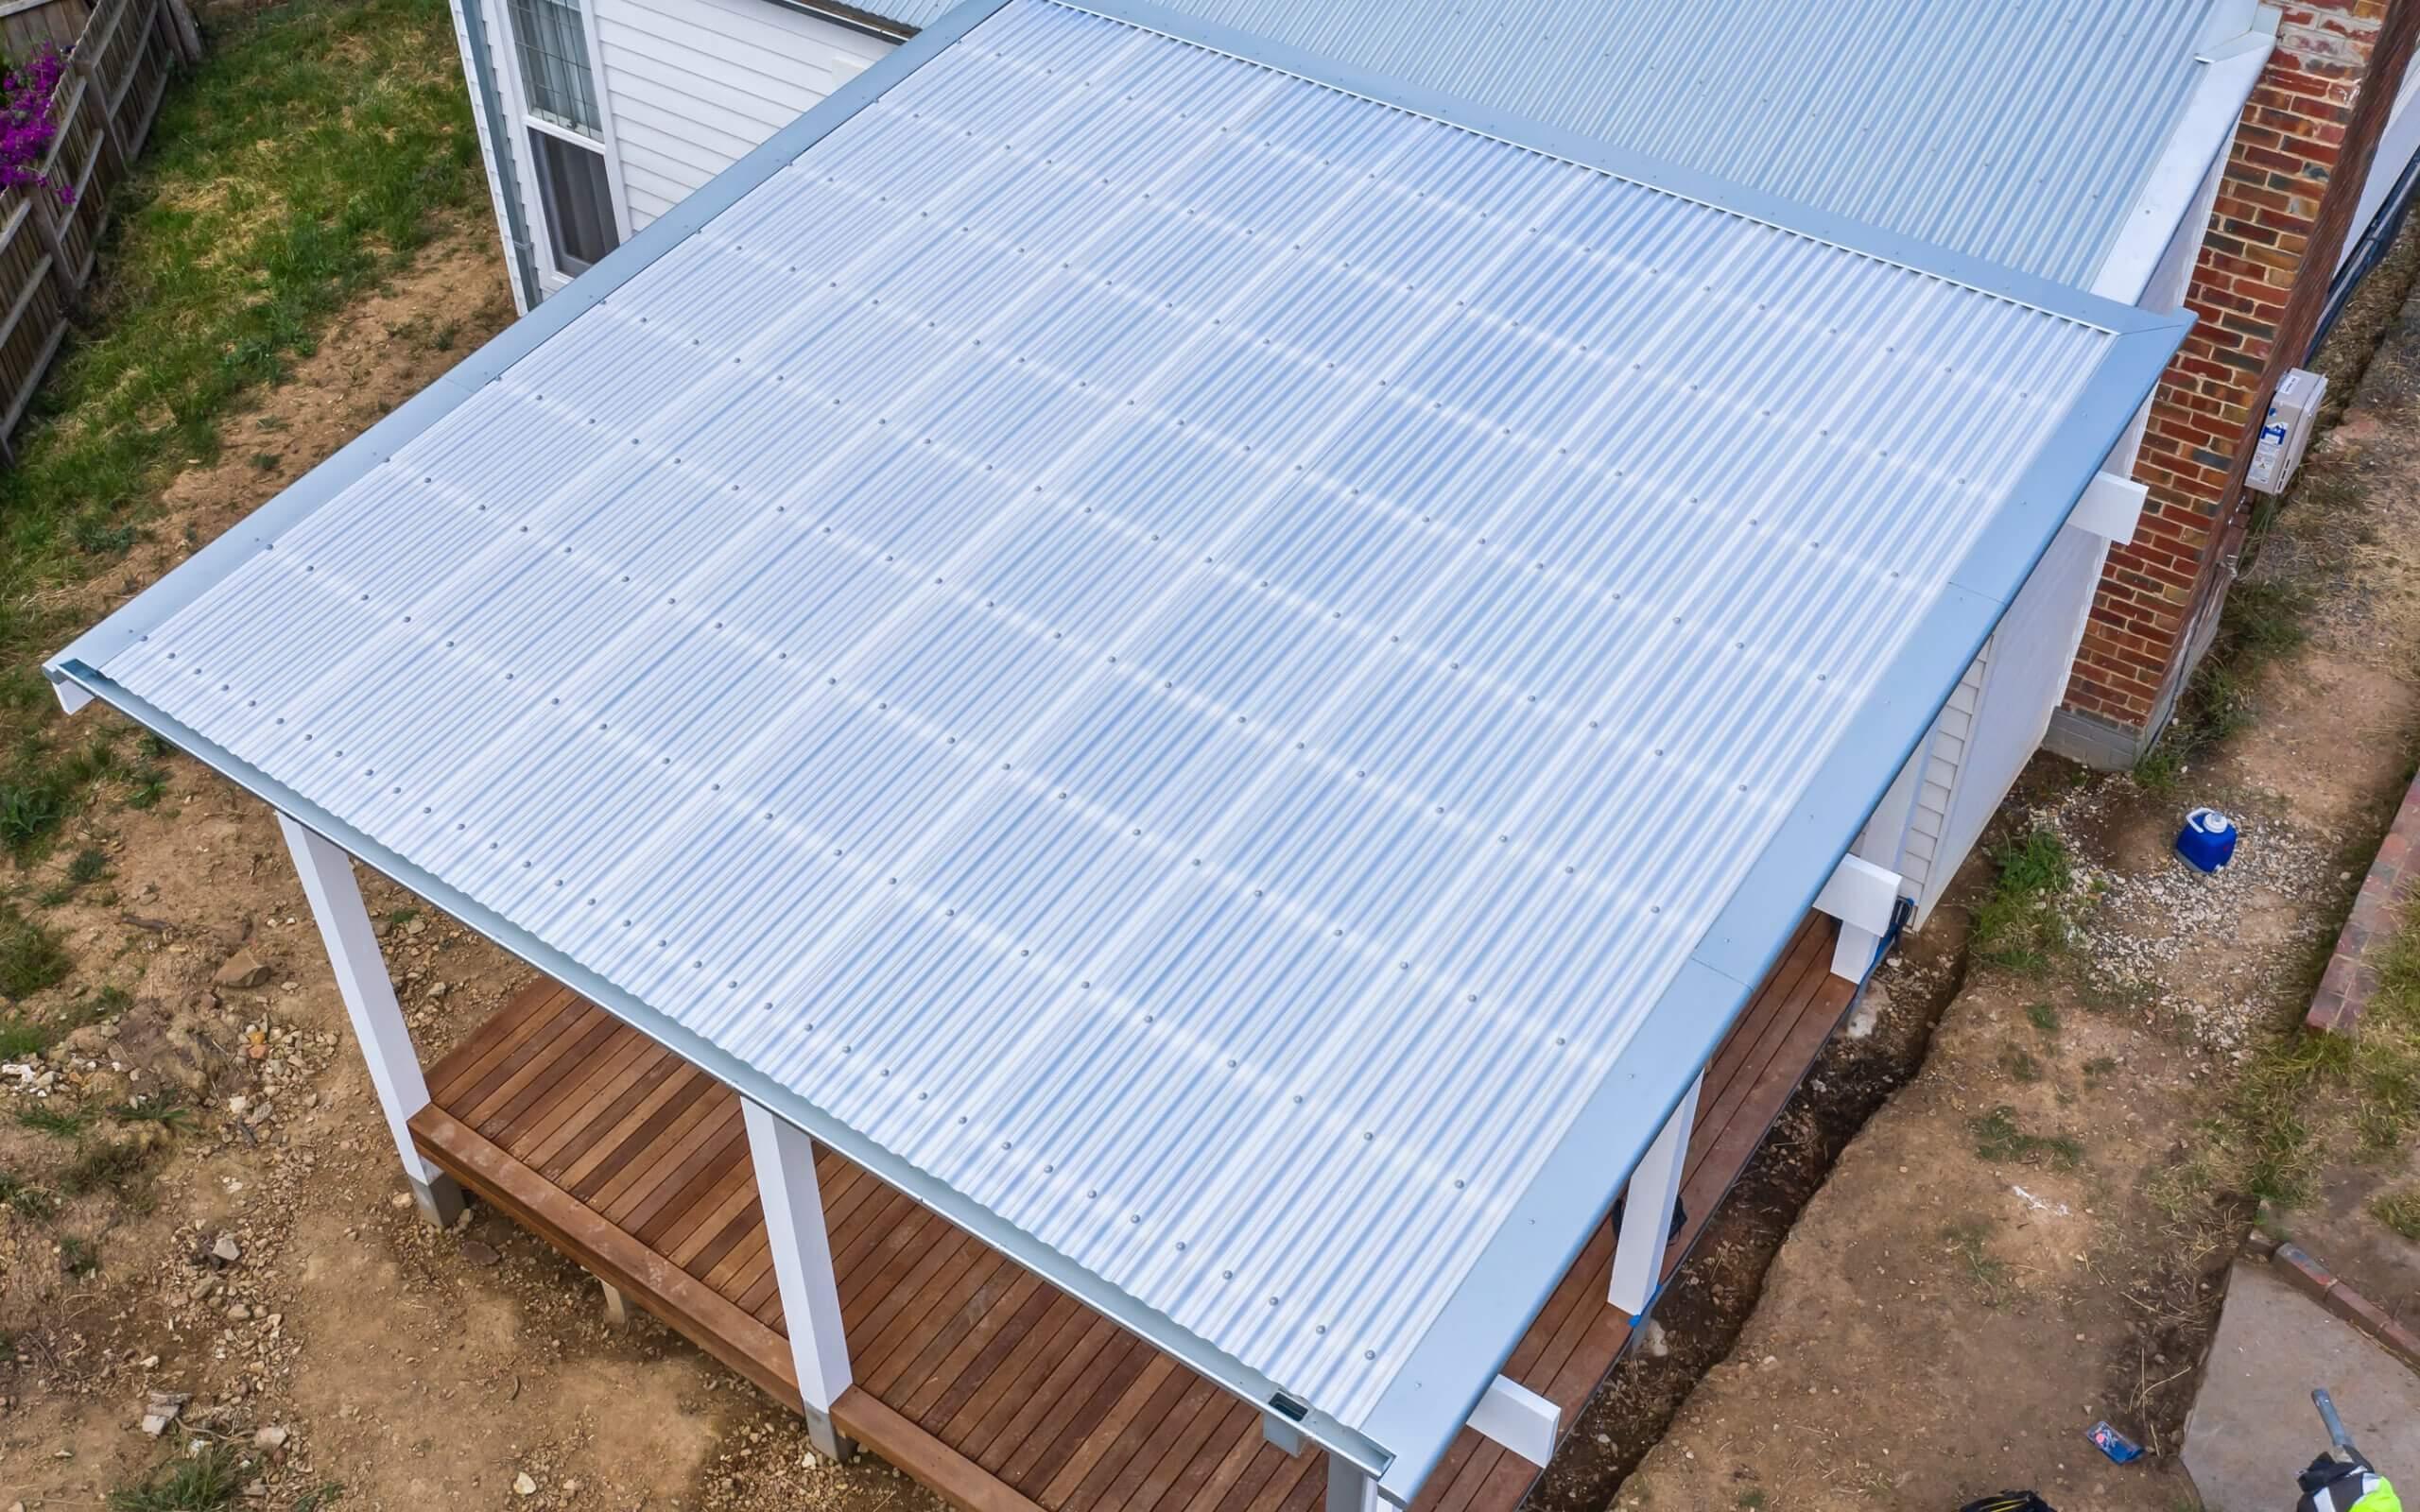 A shiny, new pergola roof